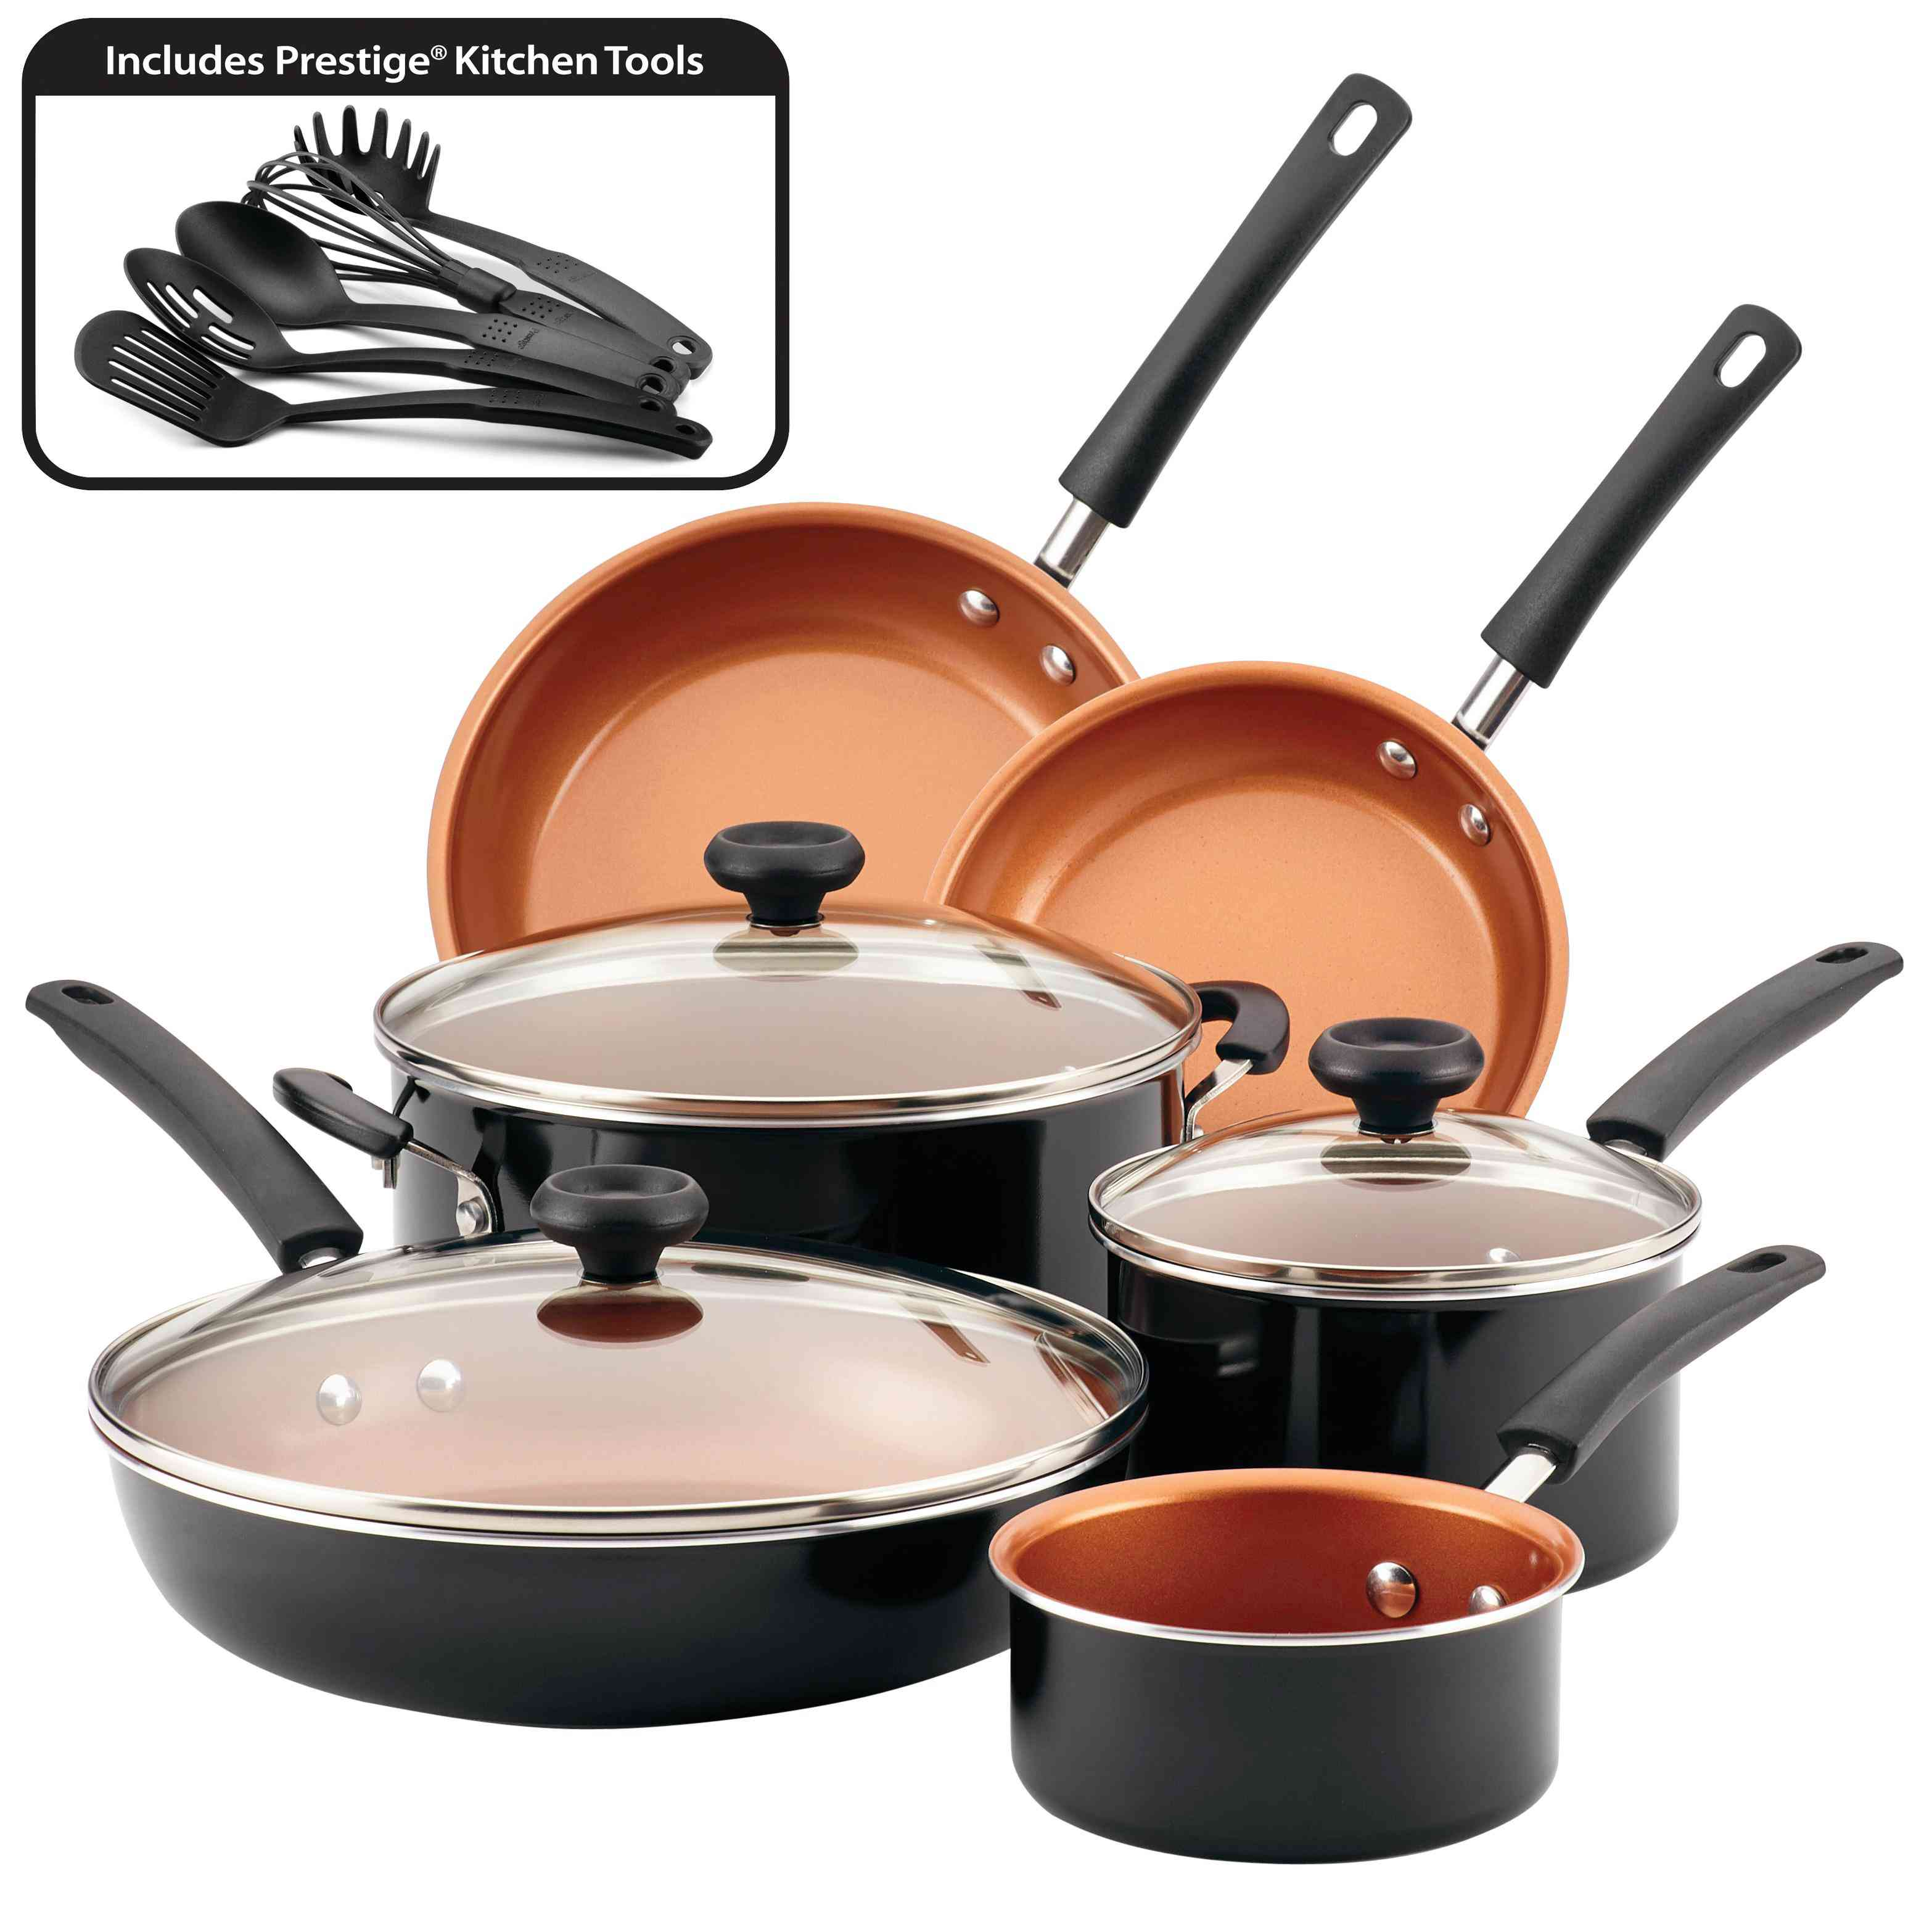 Farberware Easy Clean Pro Nonstick Black Cookware Set, 14 Piece